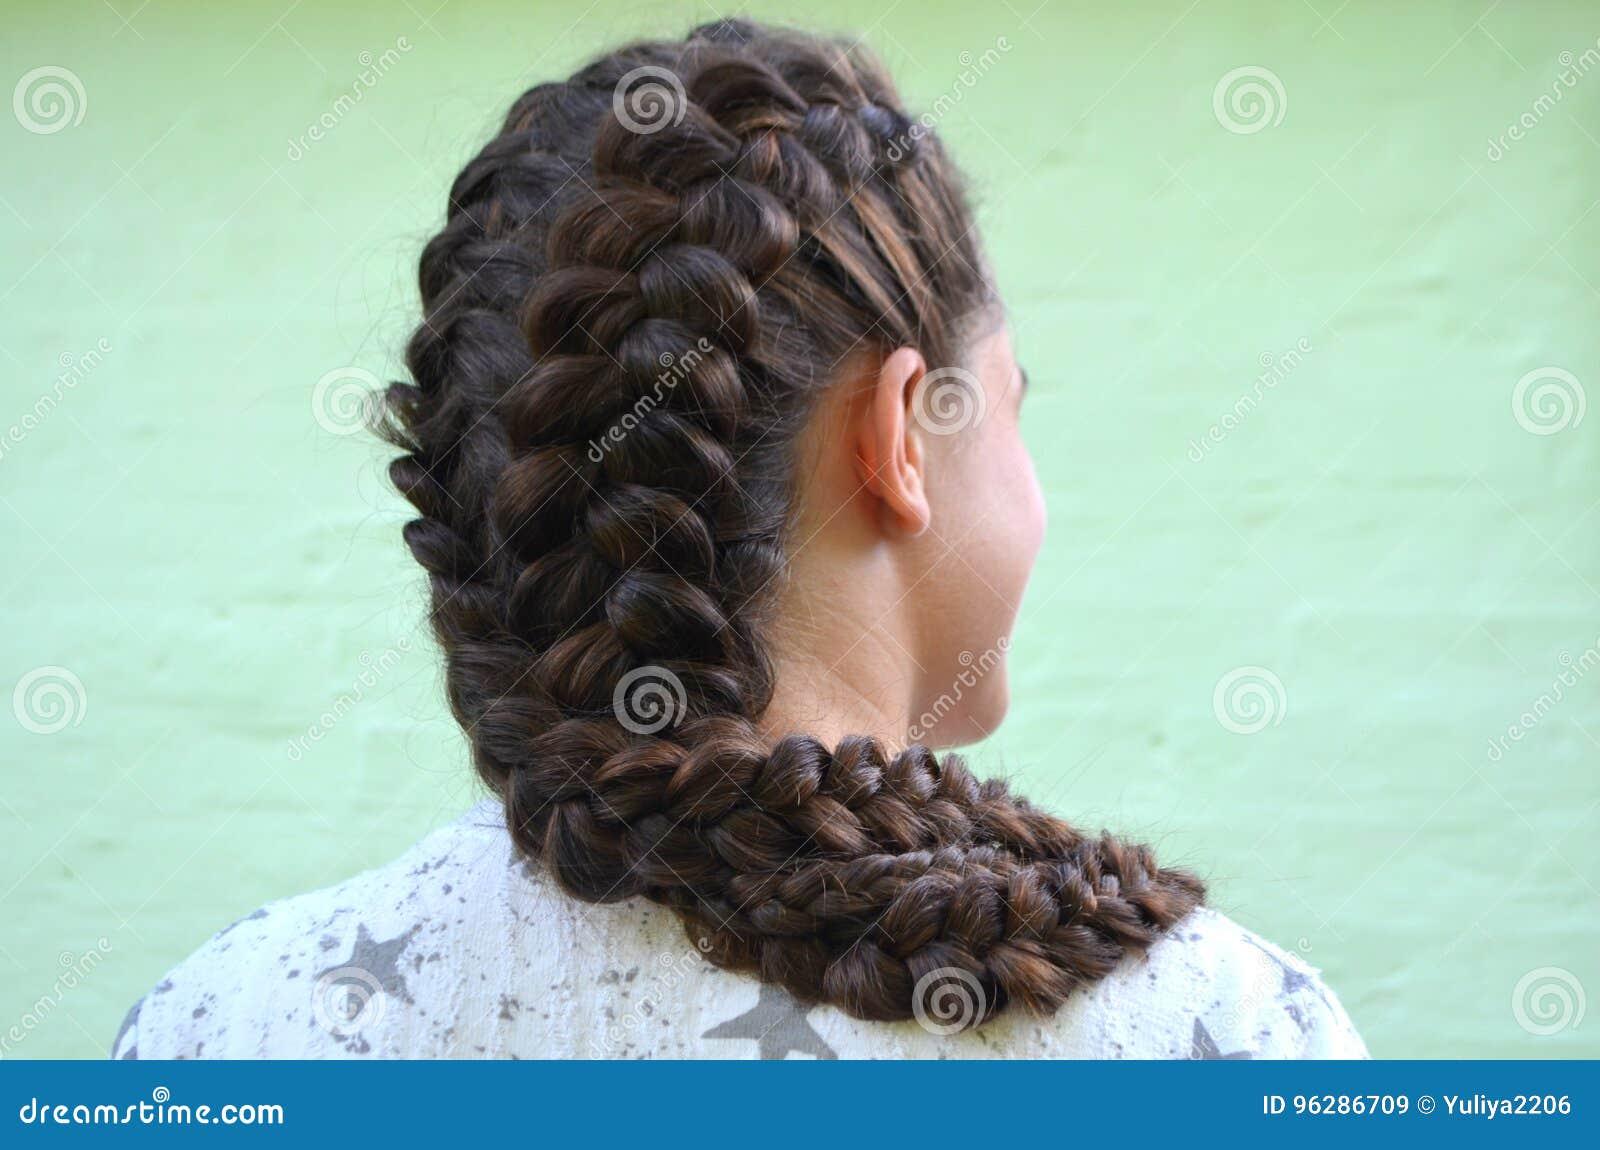 Hairstyle on medium length